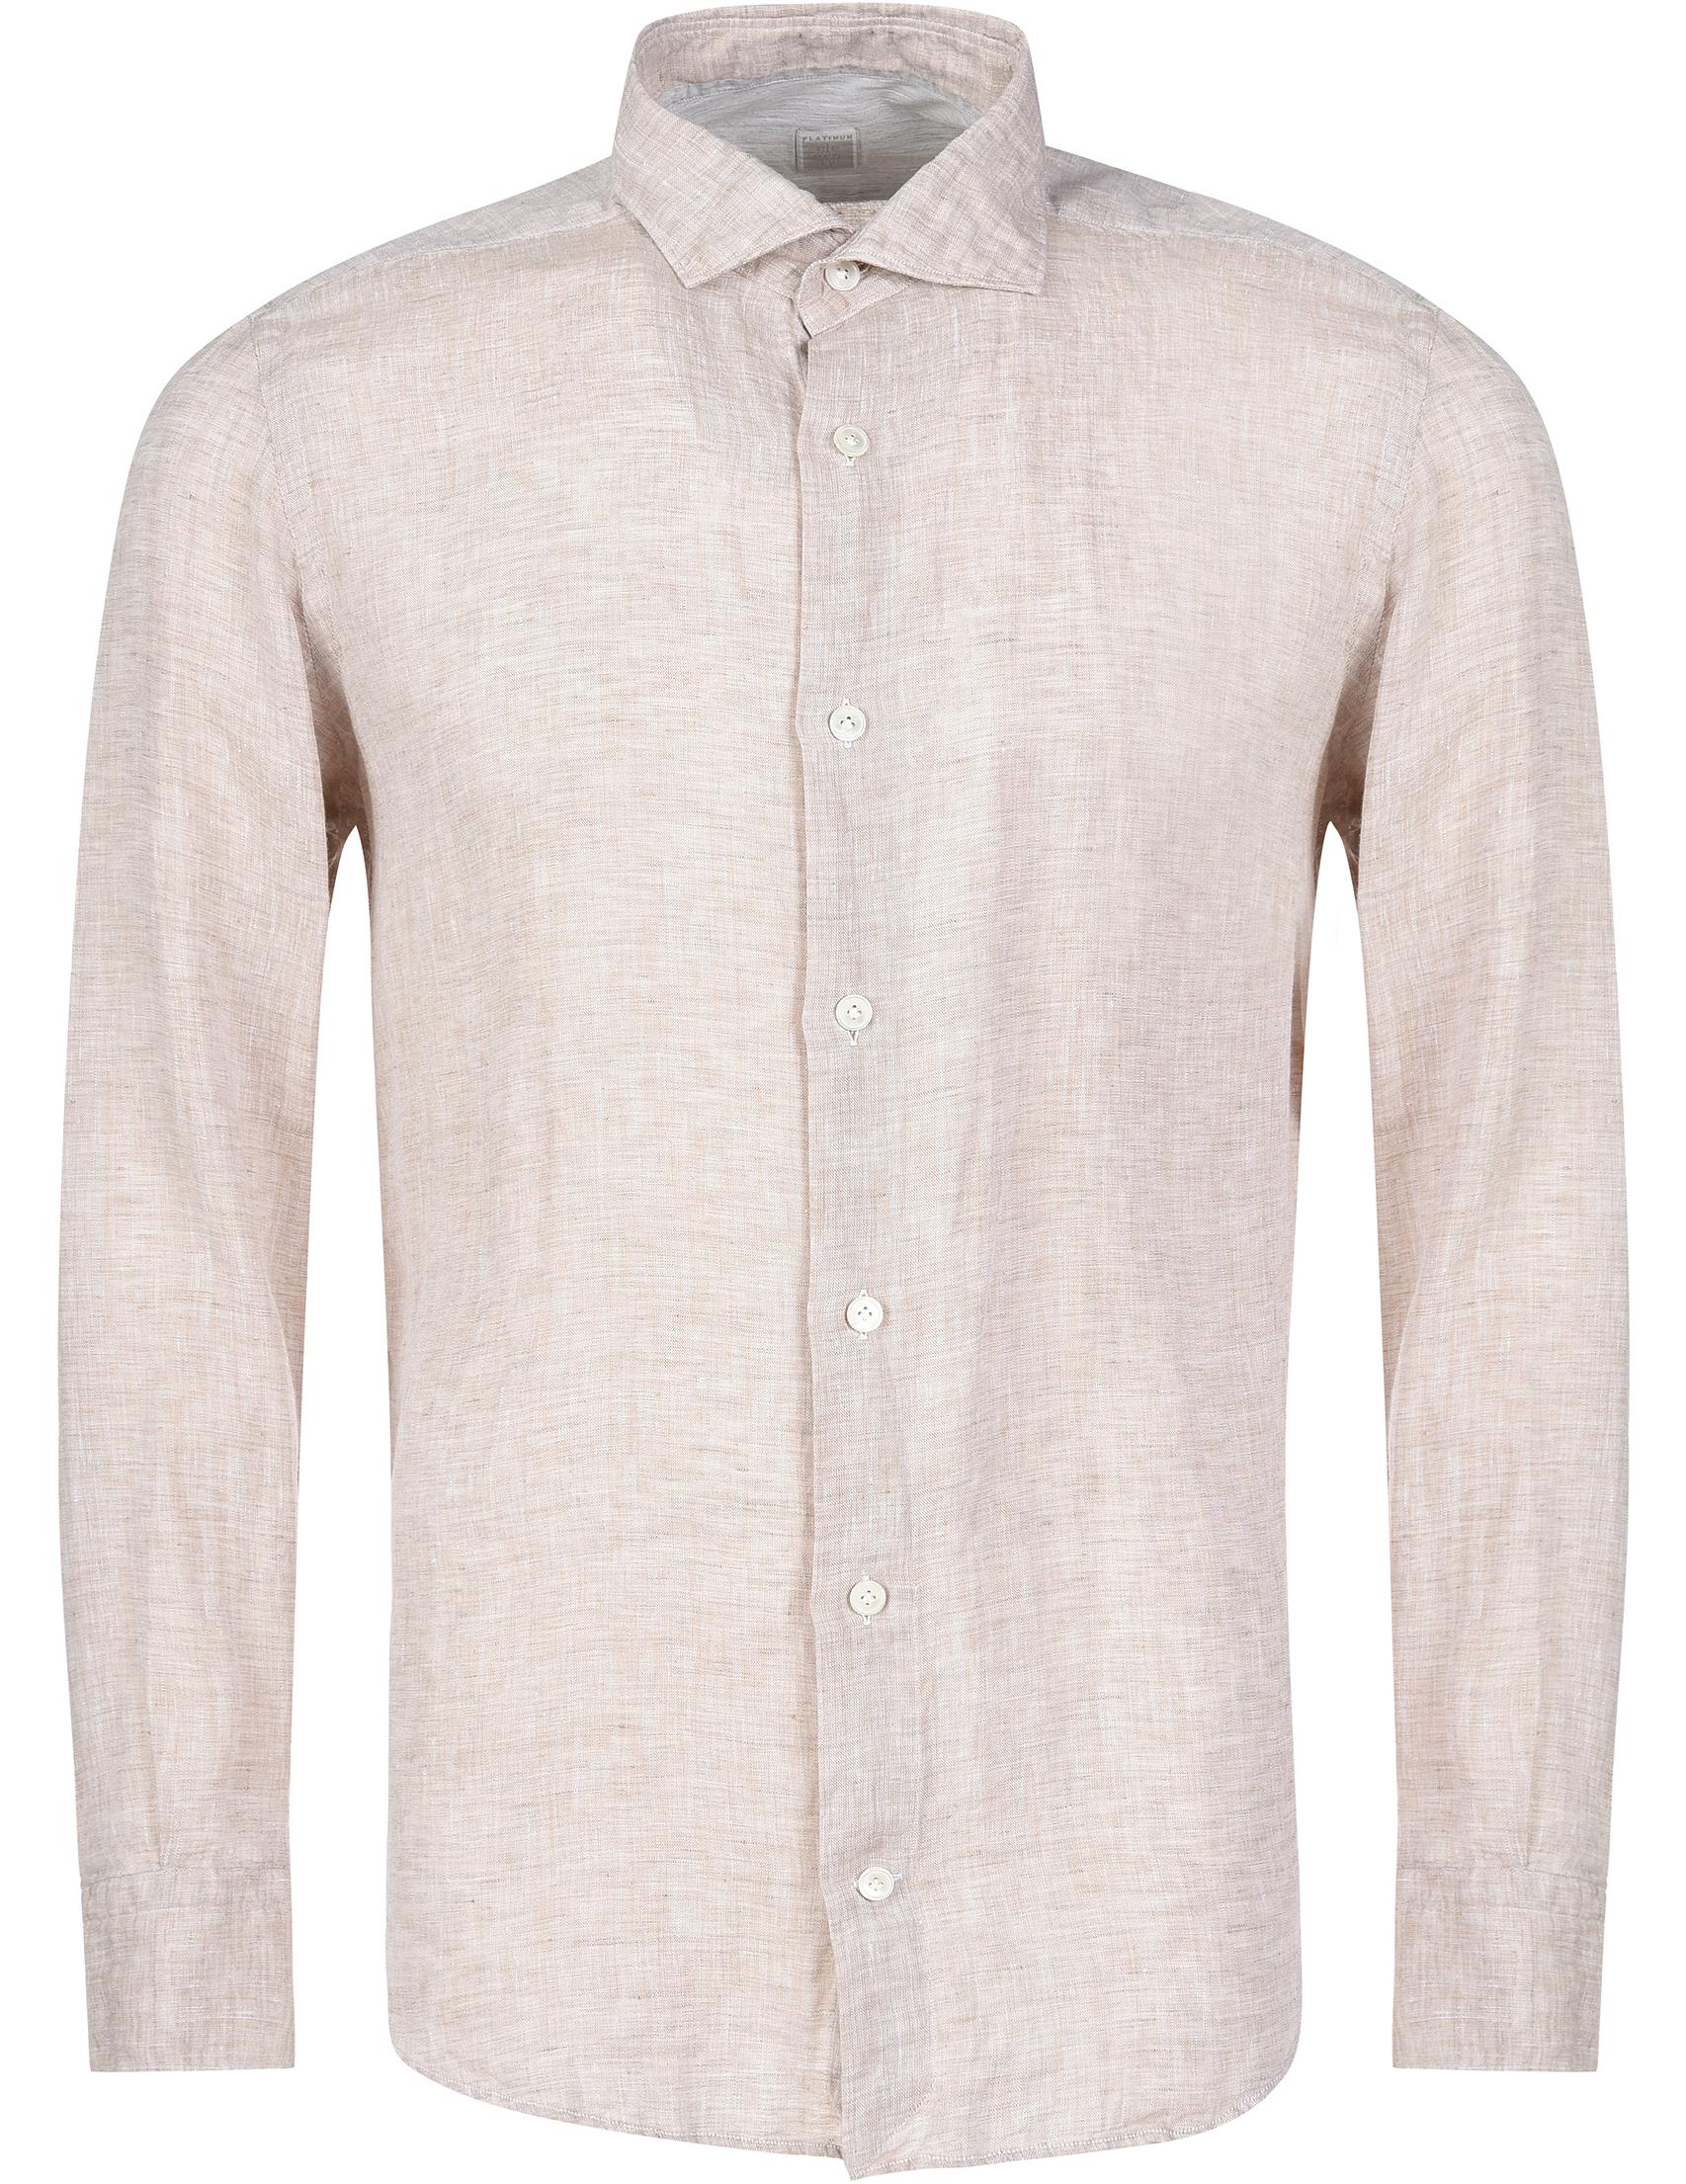 Купить Рубашки, Рубашка, ELEVENTY, Бежевый, 100%Лен, Весна-Лето